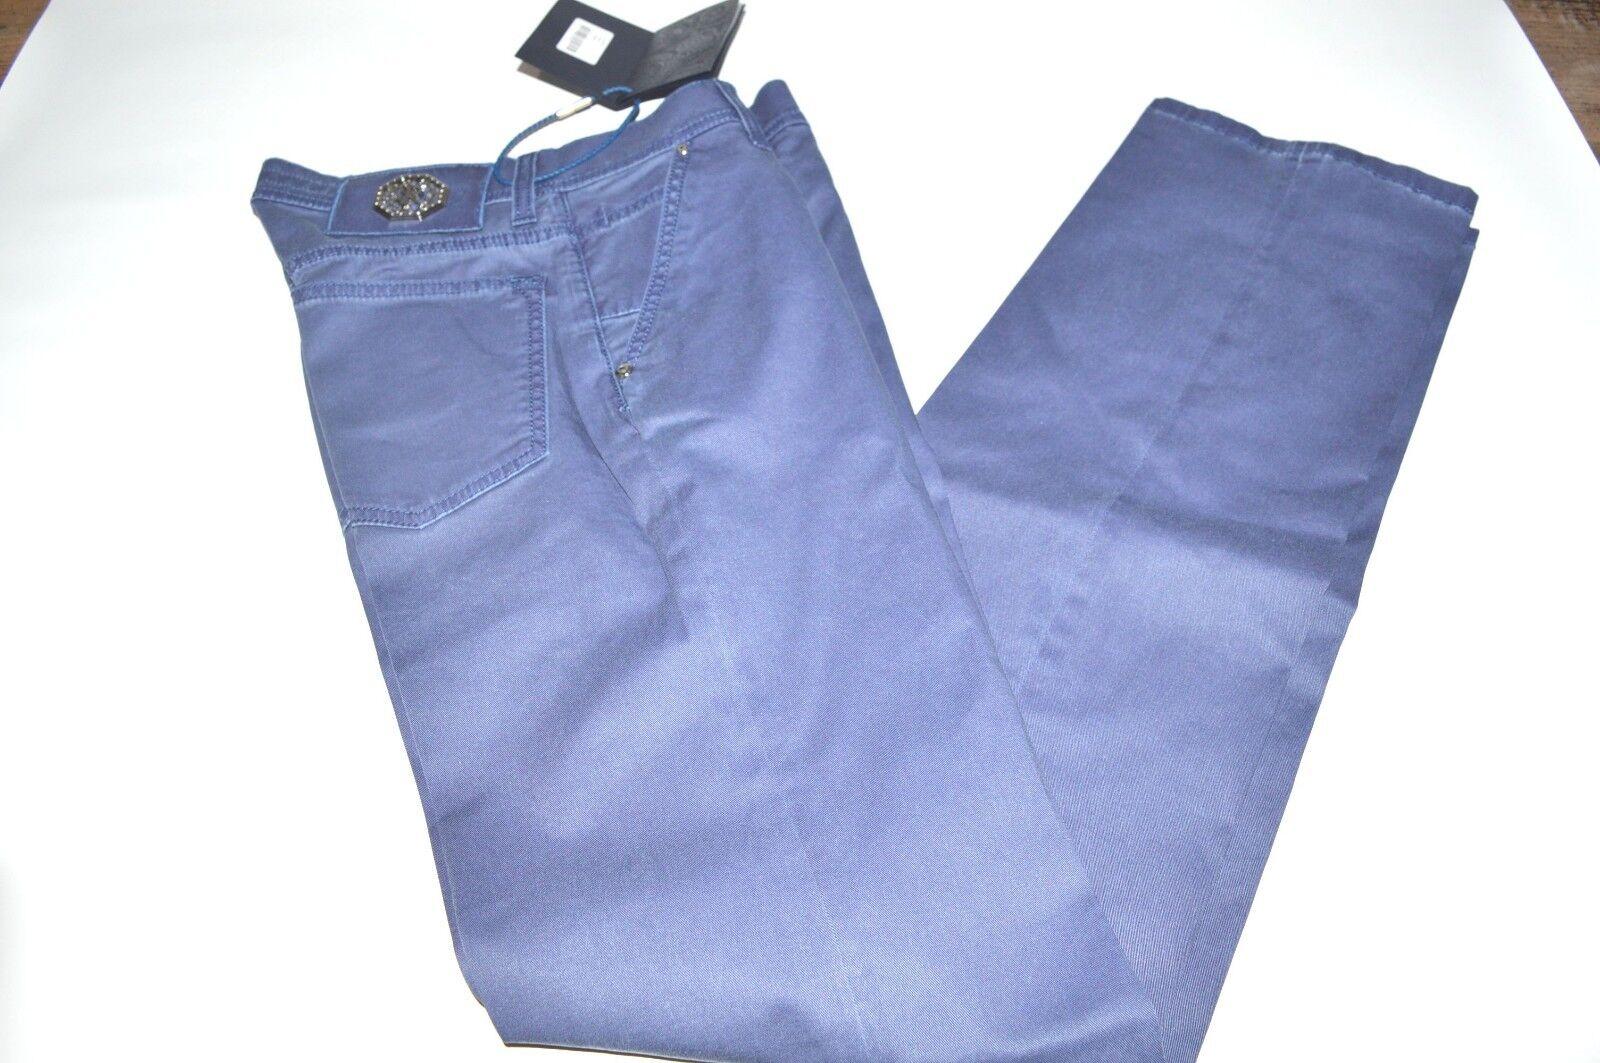 NEW STEFANO RICCI  Luxury Jeans Size 35 Us 51 Eu (1043)